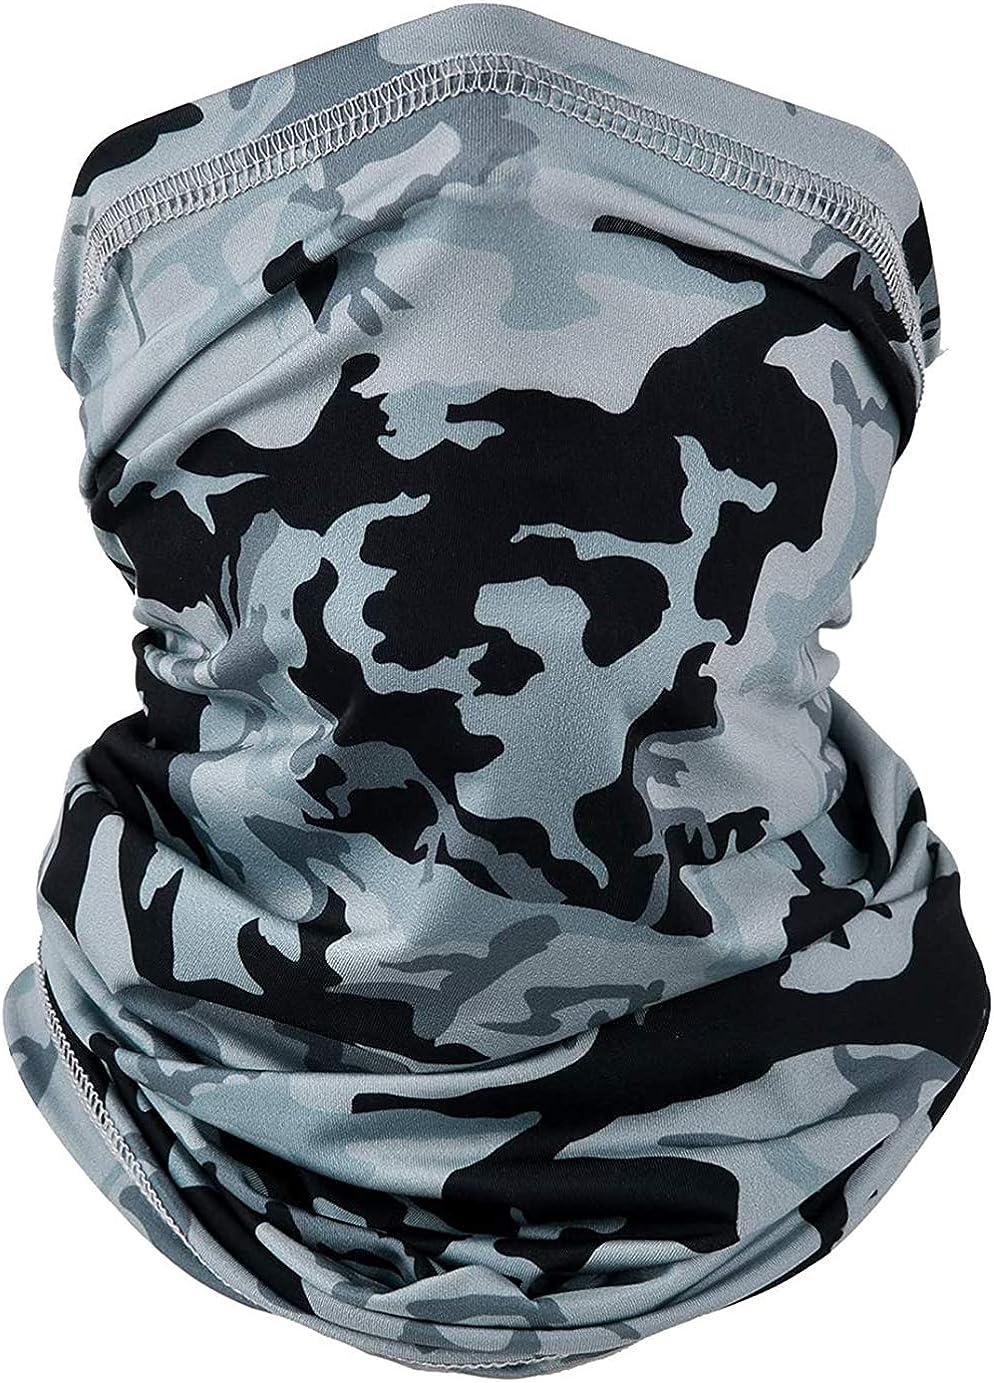 AVERYN UV Face Mask, Neck Gaiter Balaclava Bandana Headwear, Ice Silk Cooling Sports Face Scarf for Dust Outdoors